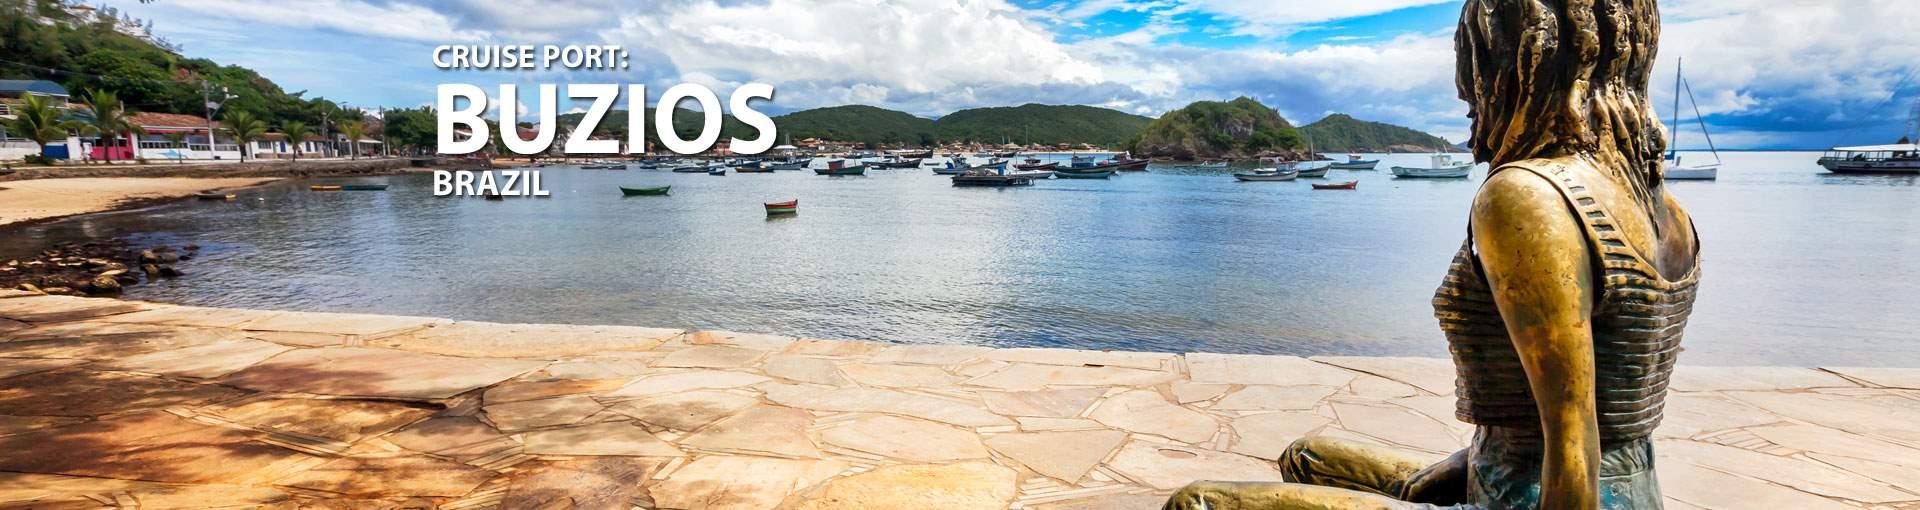 Cruises to Buzios, Brazil